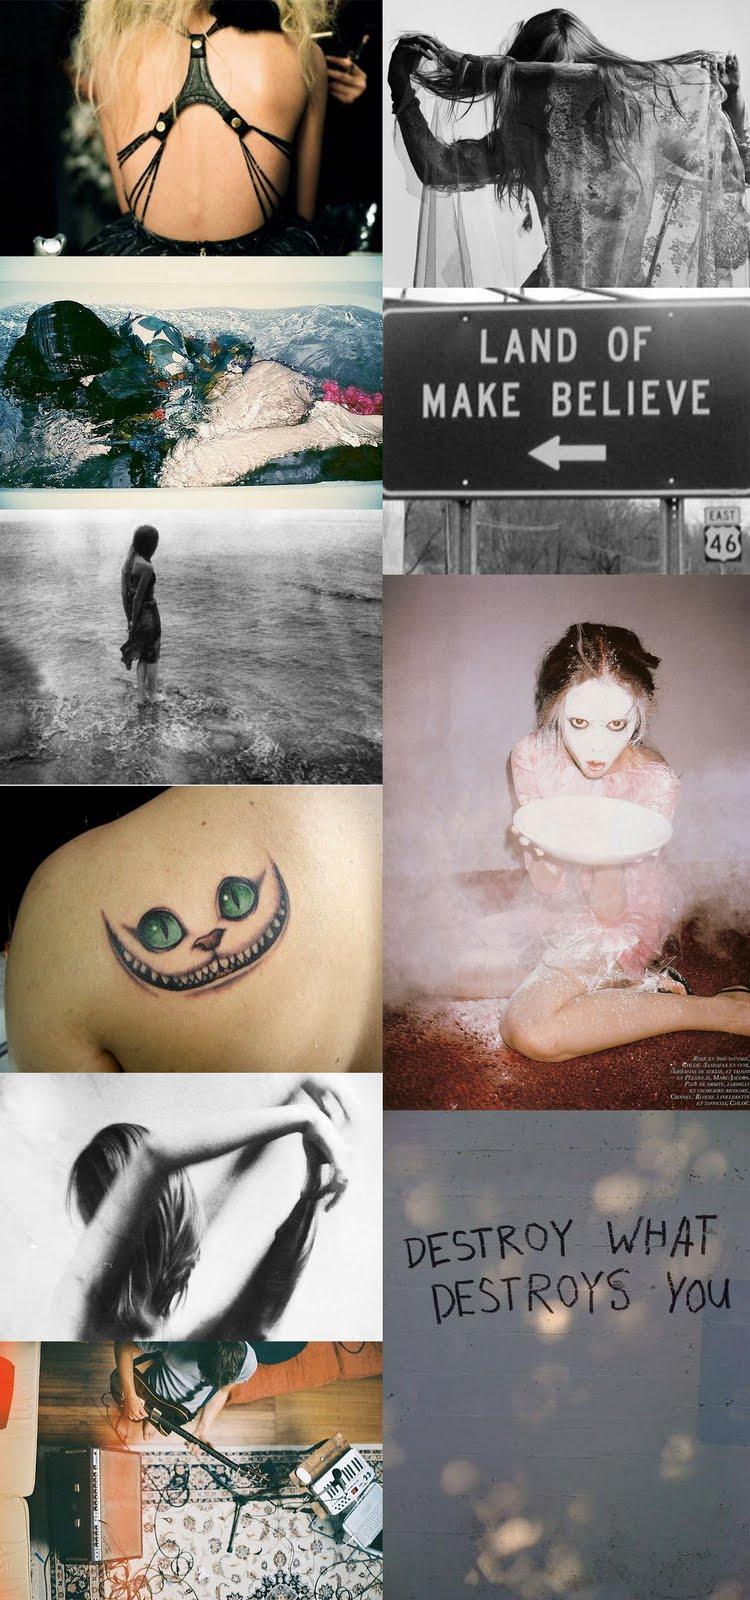 http://2.bp.blogspot.com/_twYmnhXVfP4/TApwar2fQII/AAAAAAAAJ54/aXw5R-kqx-4/s1600/inspiration.jpg